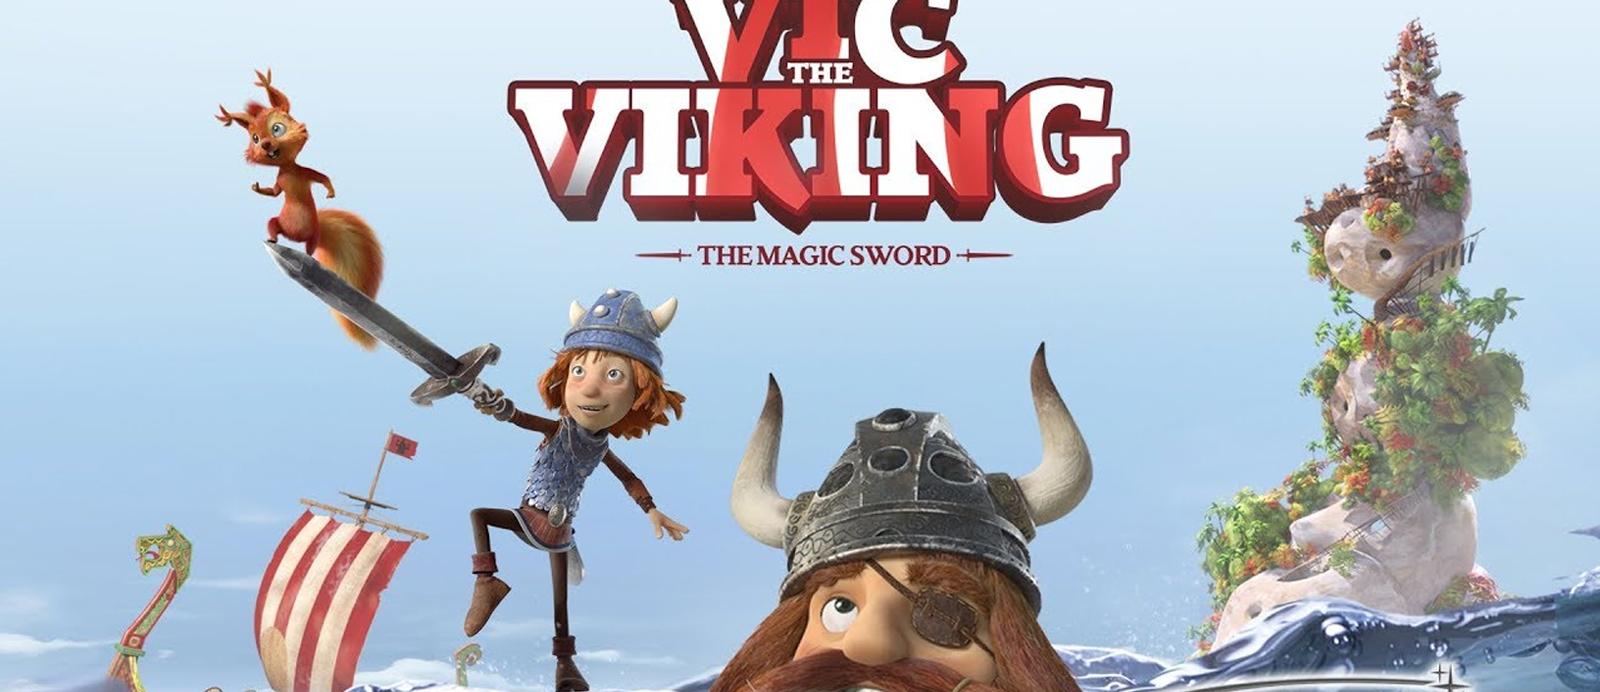 Викинг Вик и чаробни мач (Р)